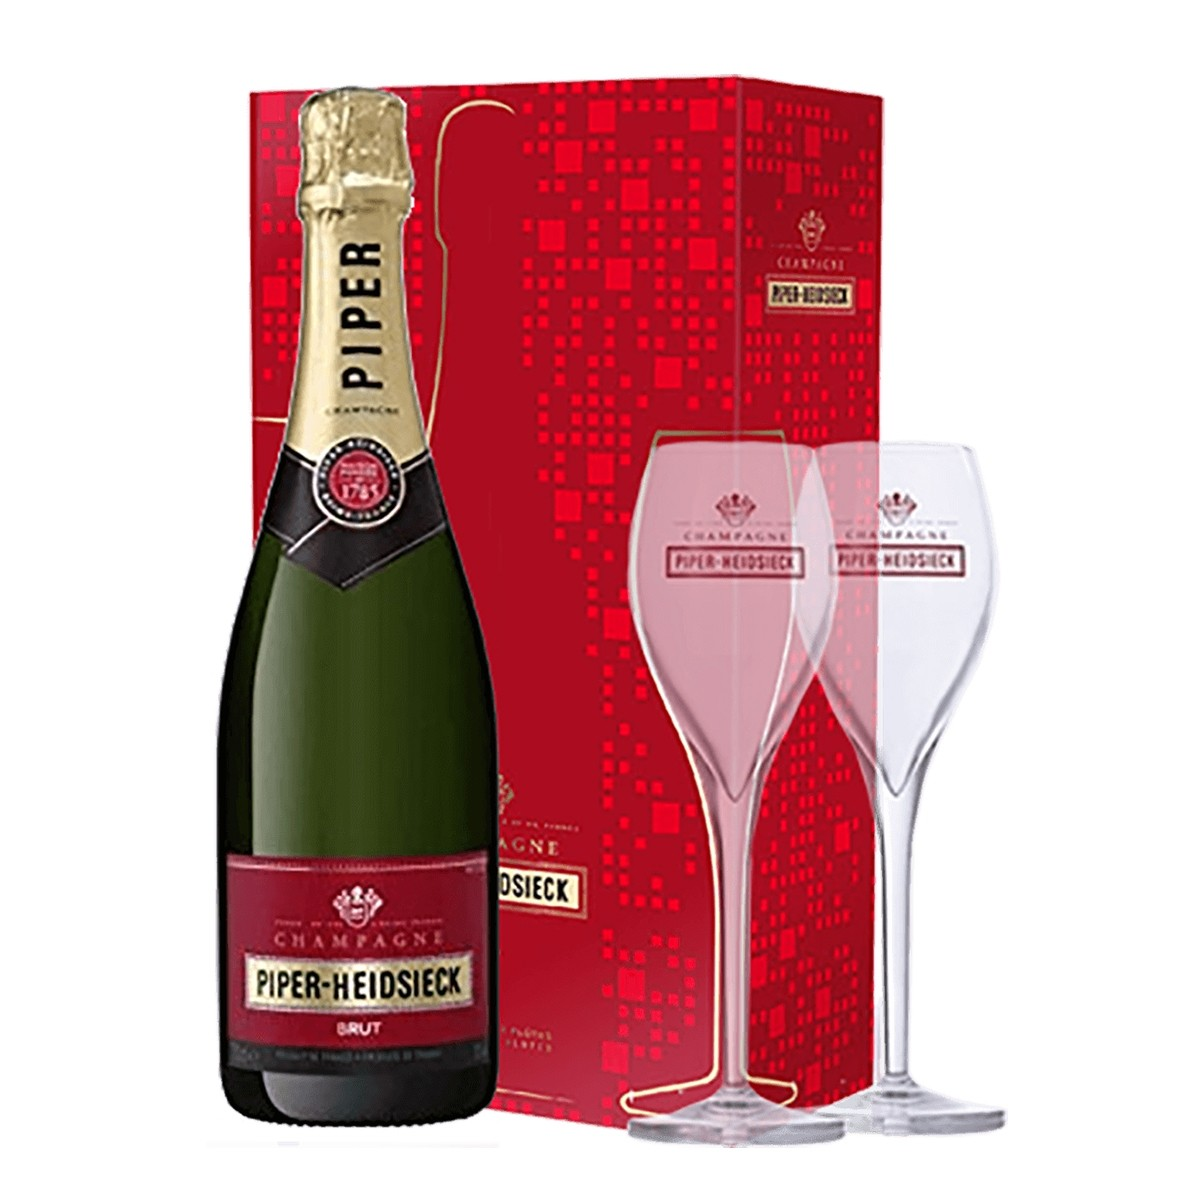 Champagne Piper Heidsieck Brut 750 ml + 2 pahare